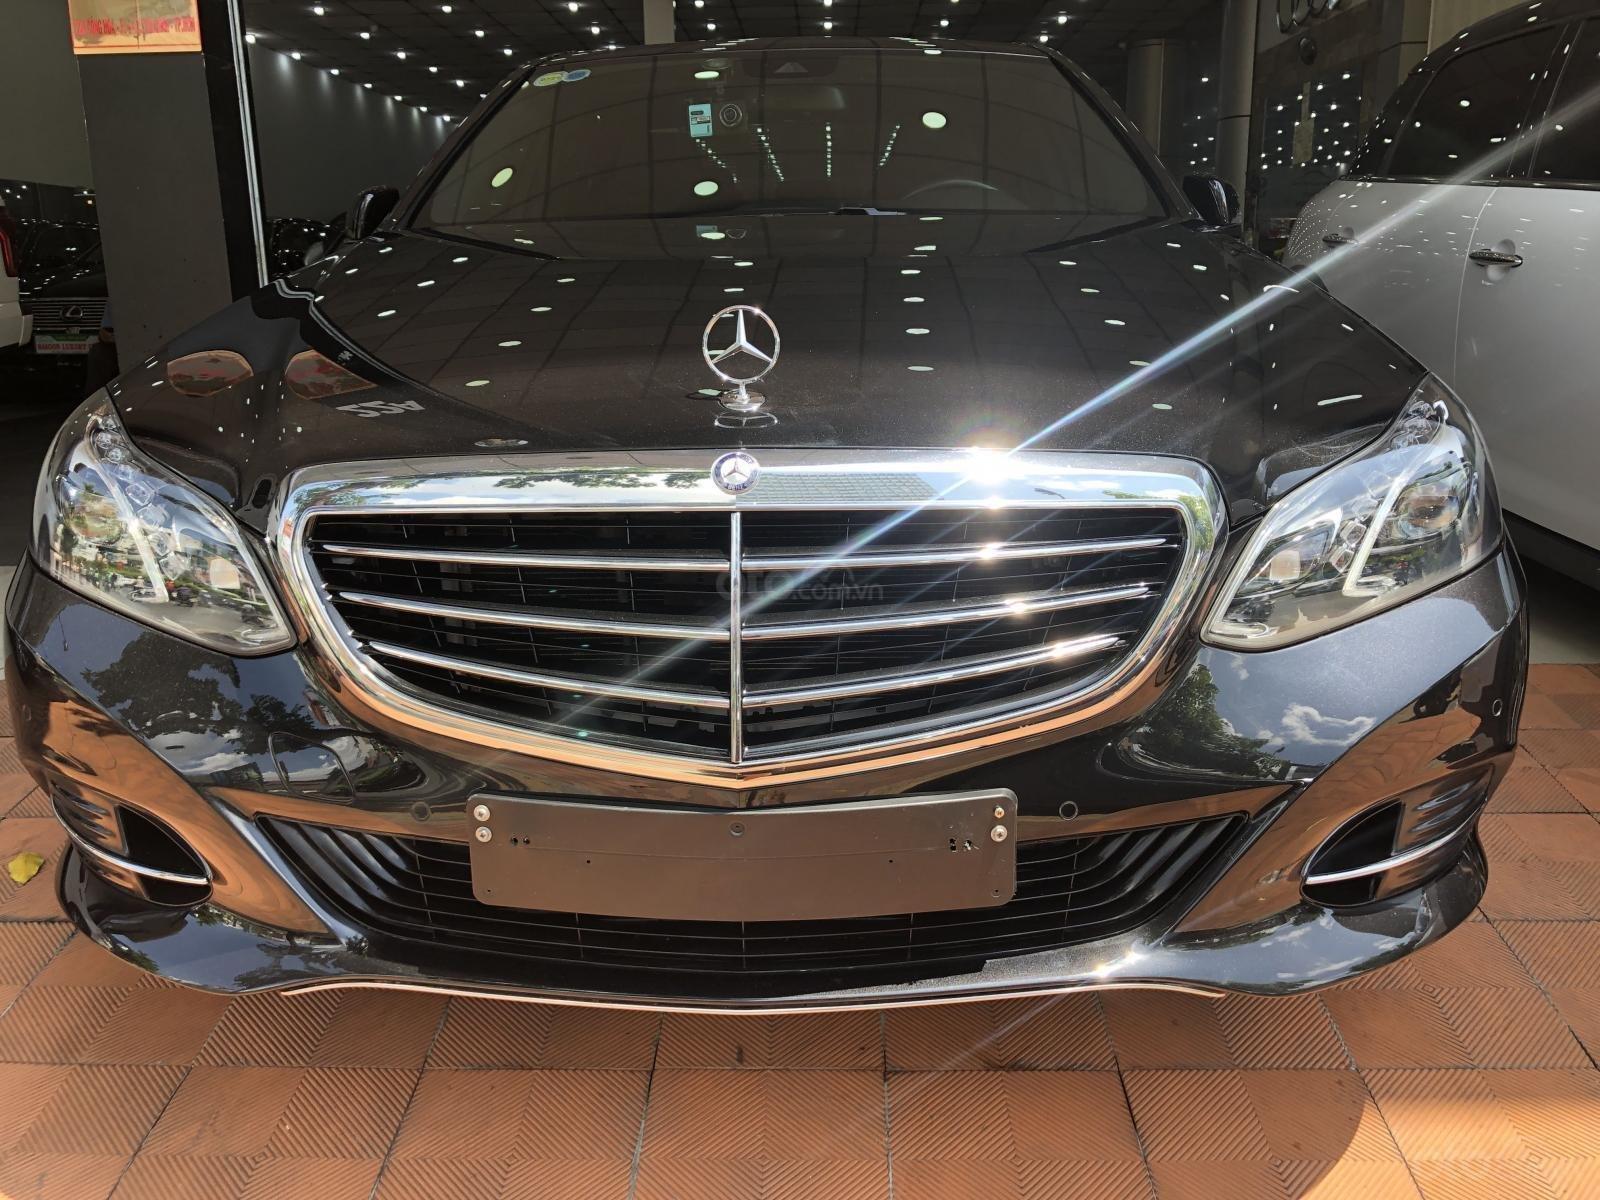 Cần bán xe Mercedes-Benz E200 sản xuất 2015, ĐKLĐ 2016 (1)